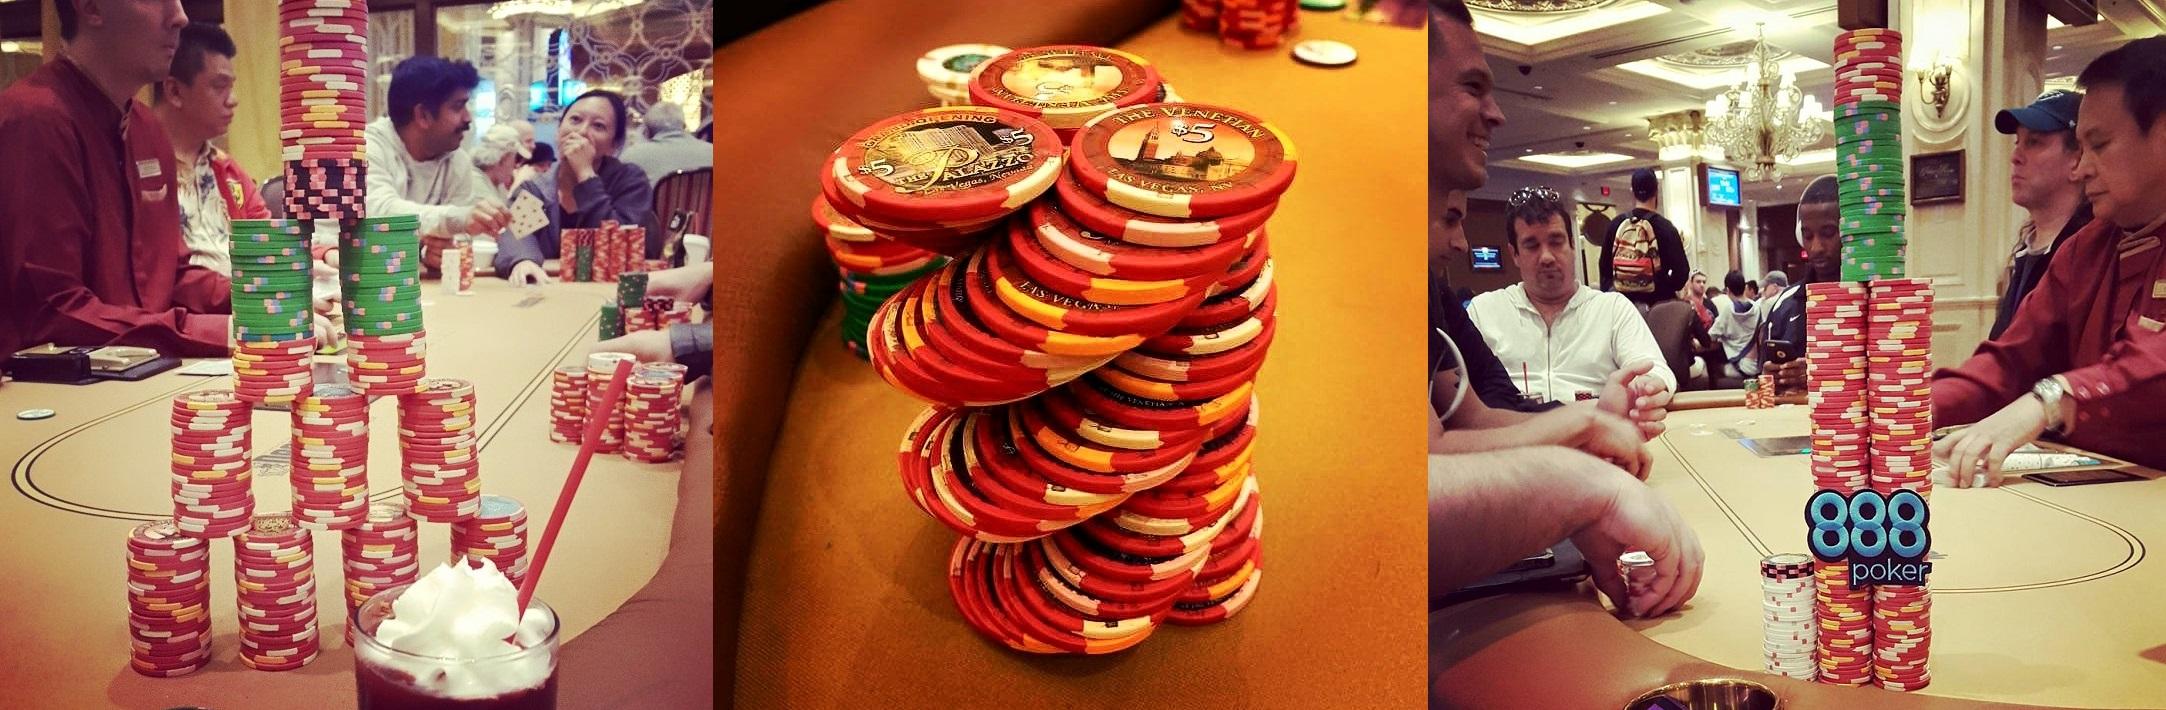 cash game 2015 venetian